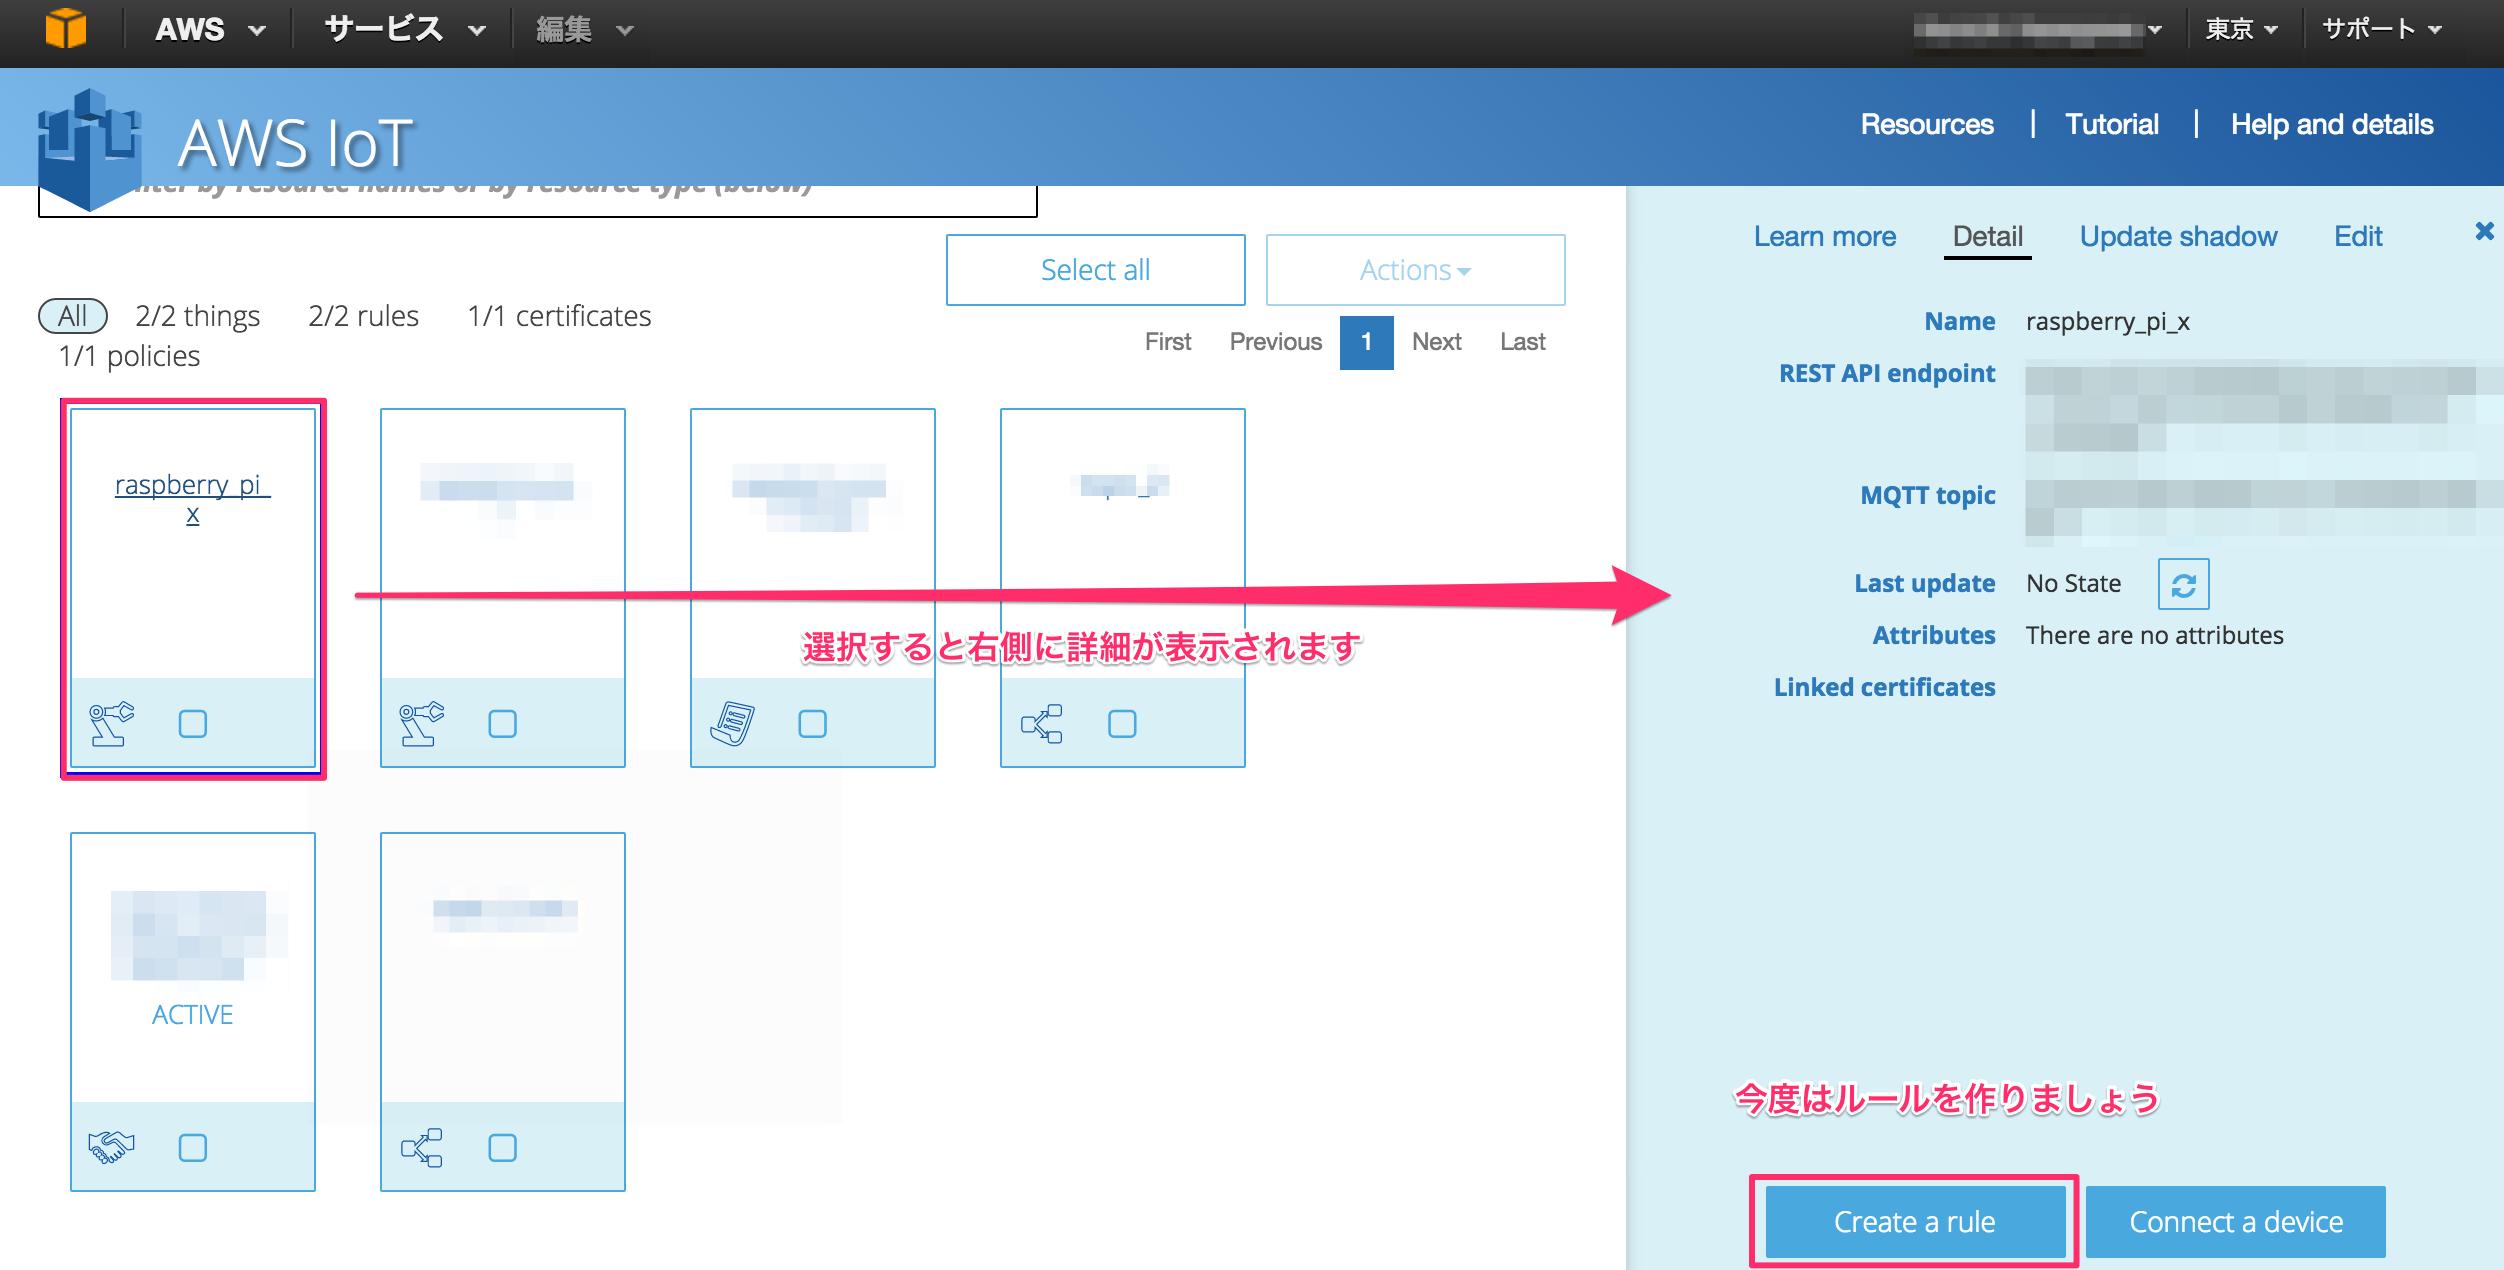 Window_と_AWS_IoT 7.png